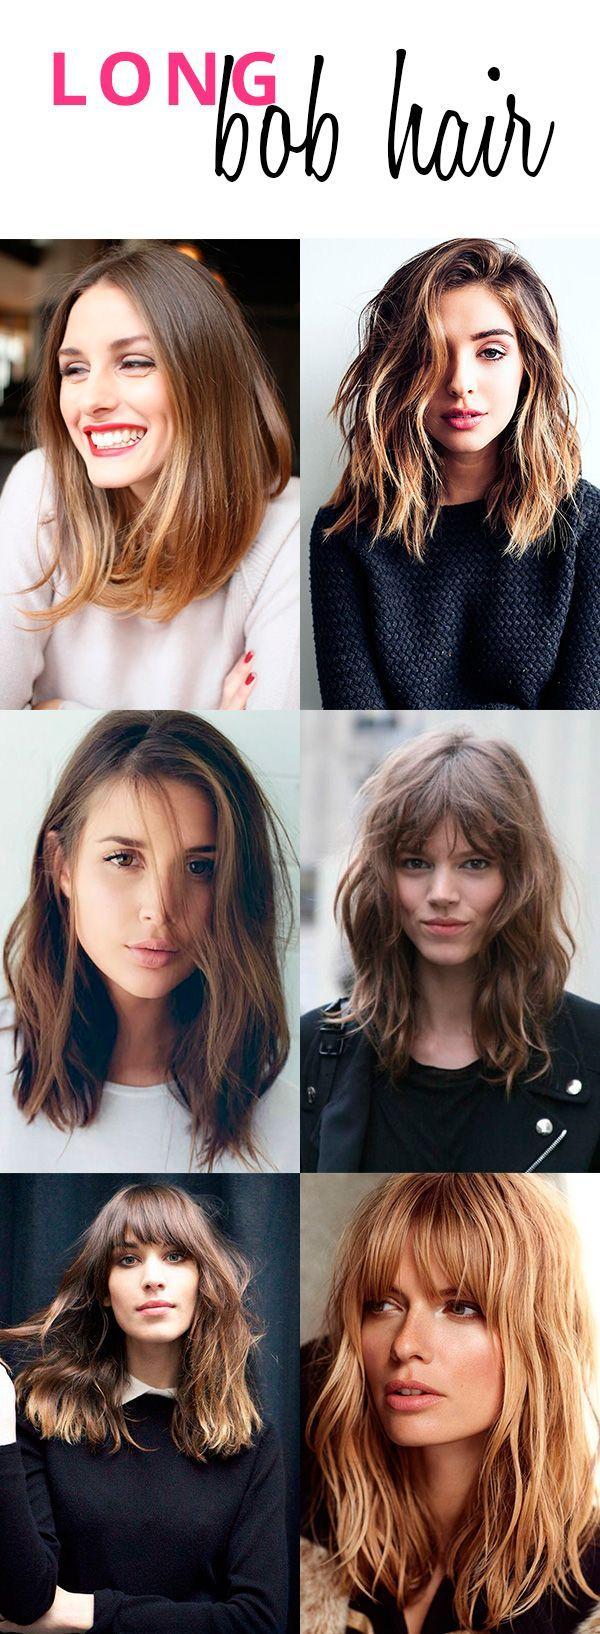 best ideas about modelos de cabelos medios on pinterest cabelo